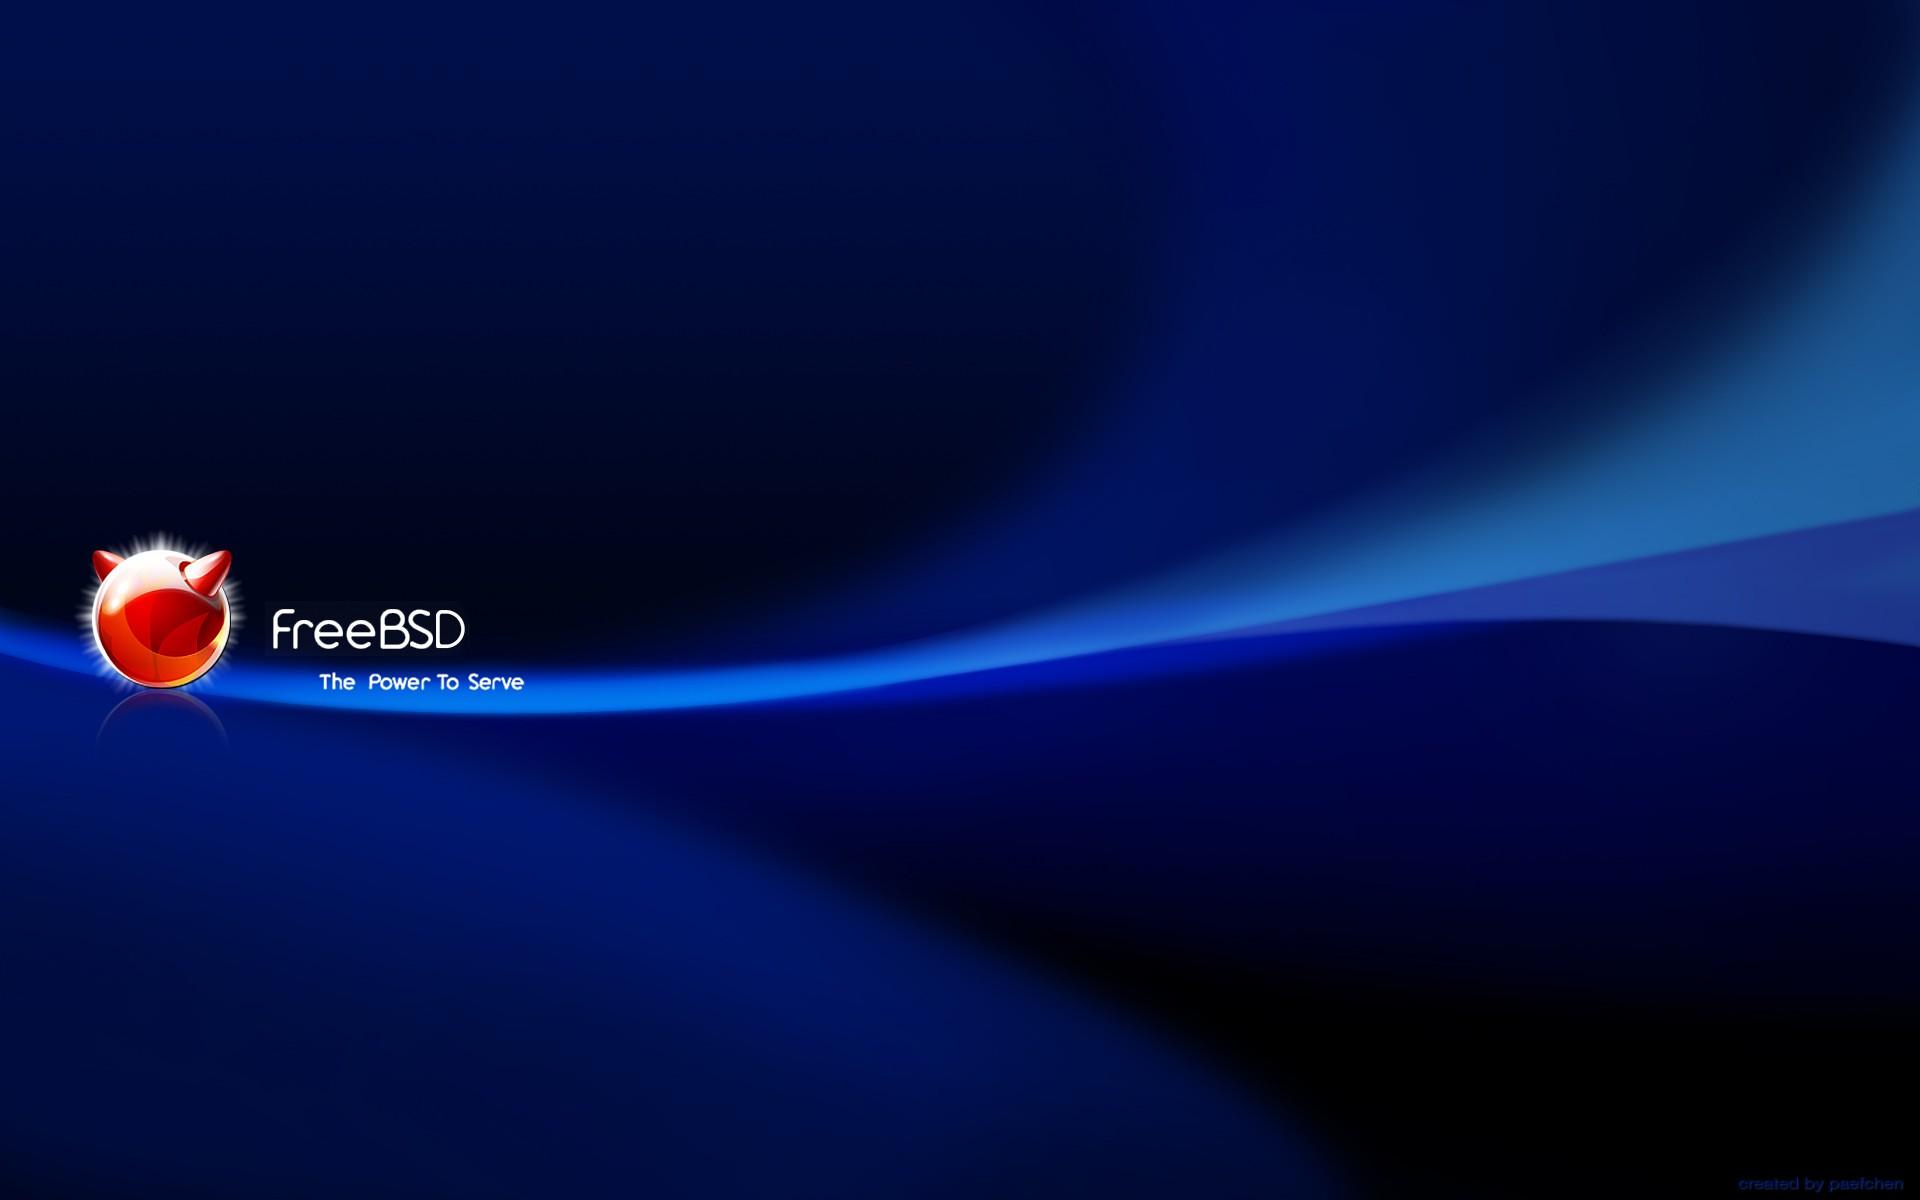 FreeBSD blue brand freebsd 1920x1200